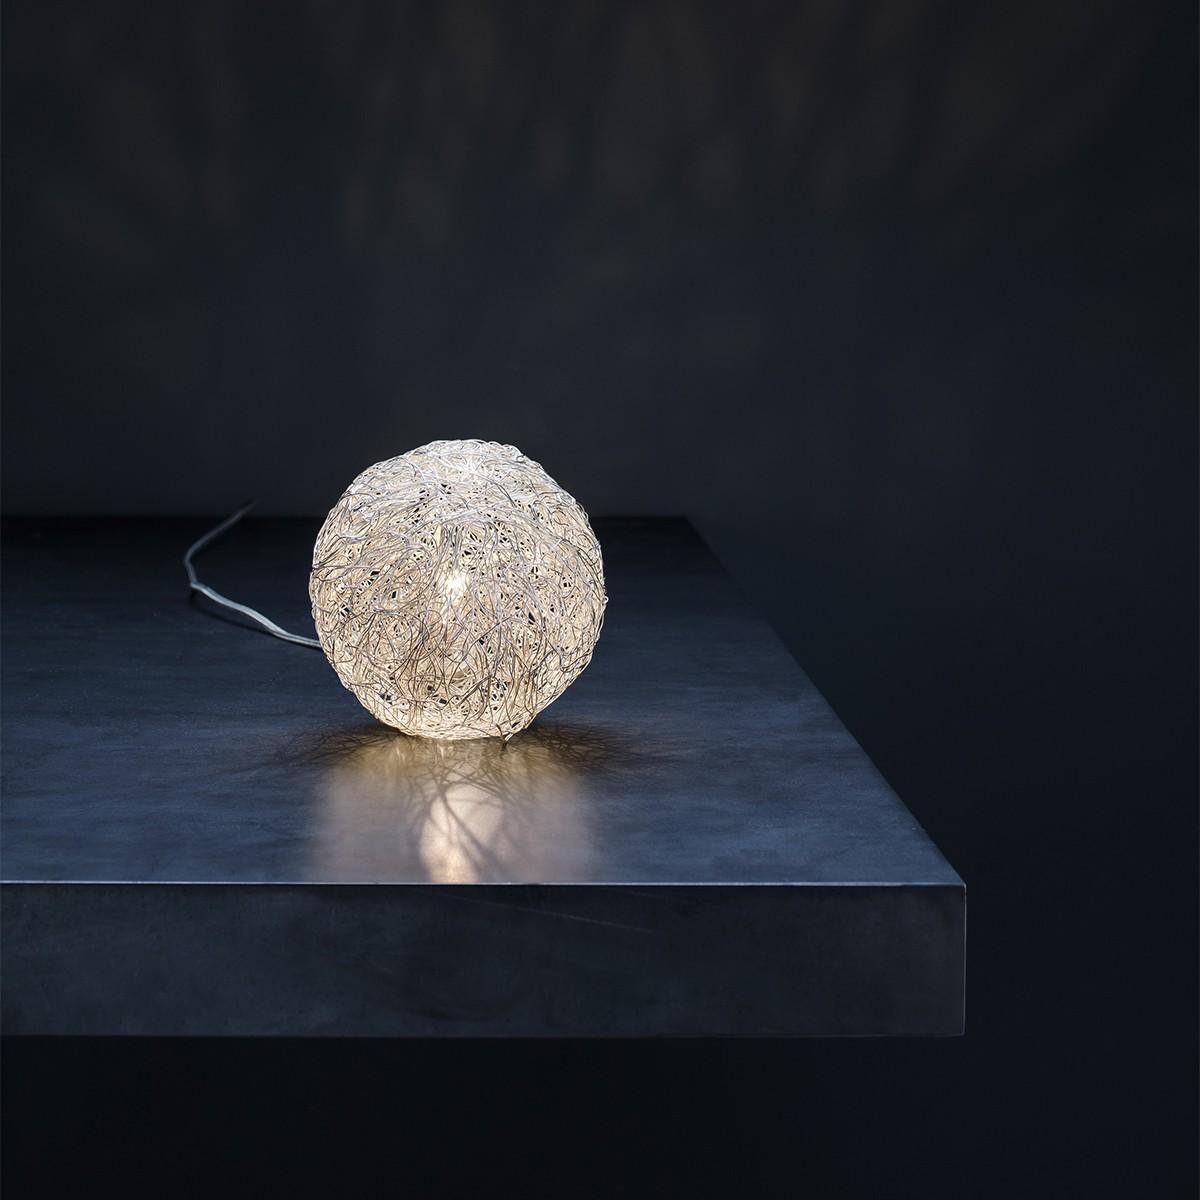 Catellani & Smith Sweet Light T Tischleuchte, Ø: 10 cm, Aluminium